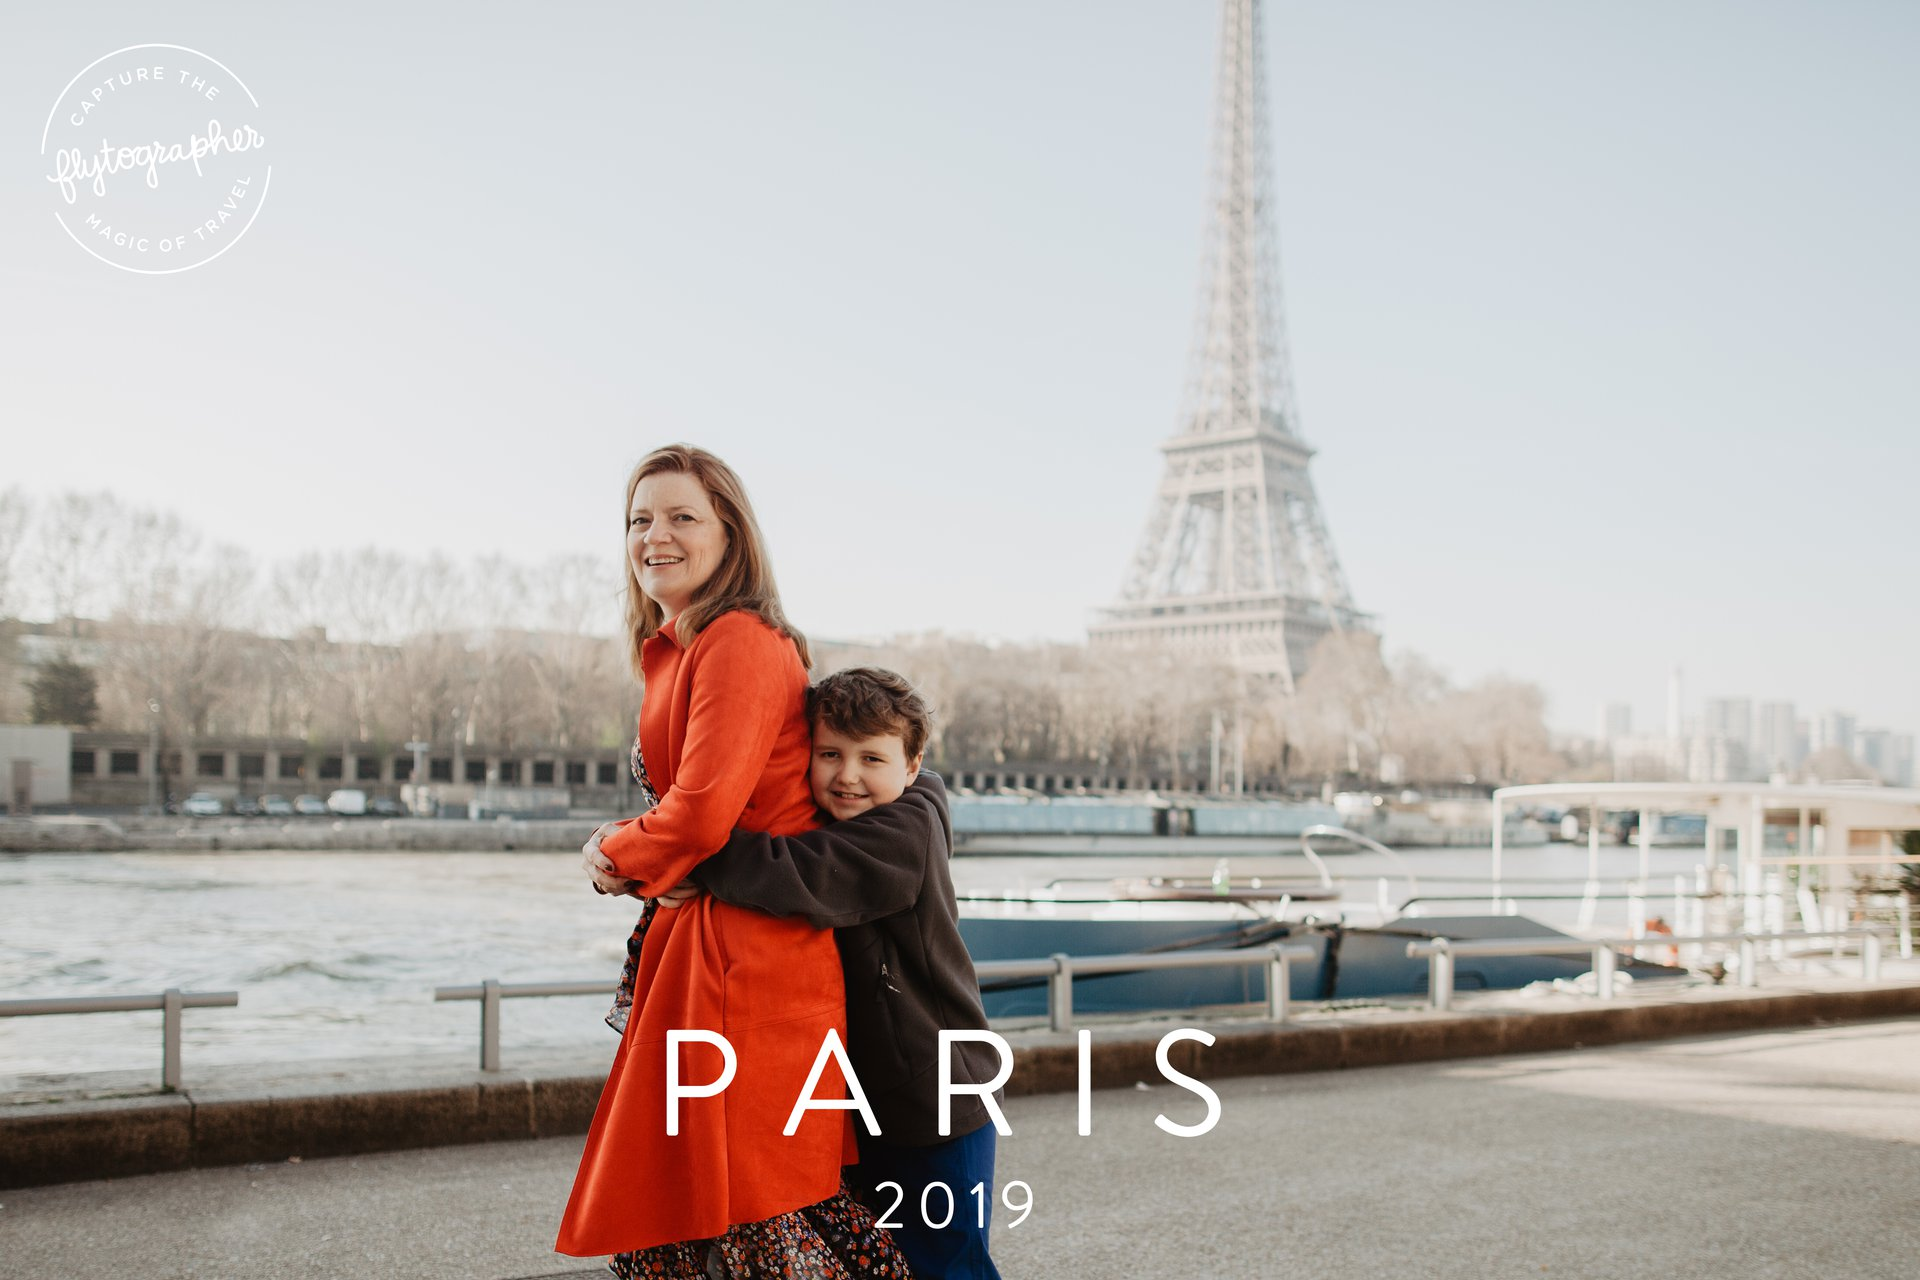 Flytographer Travel Story - Paris Trip